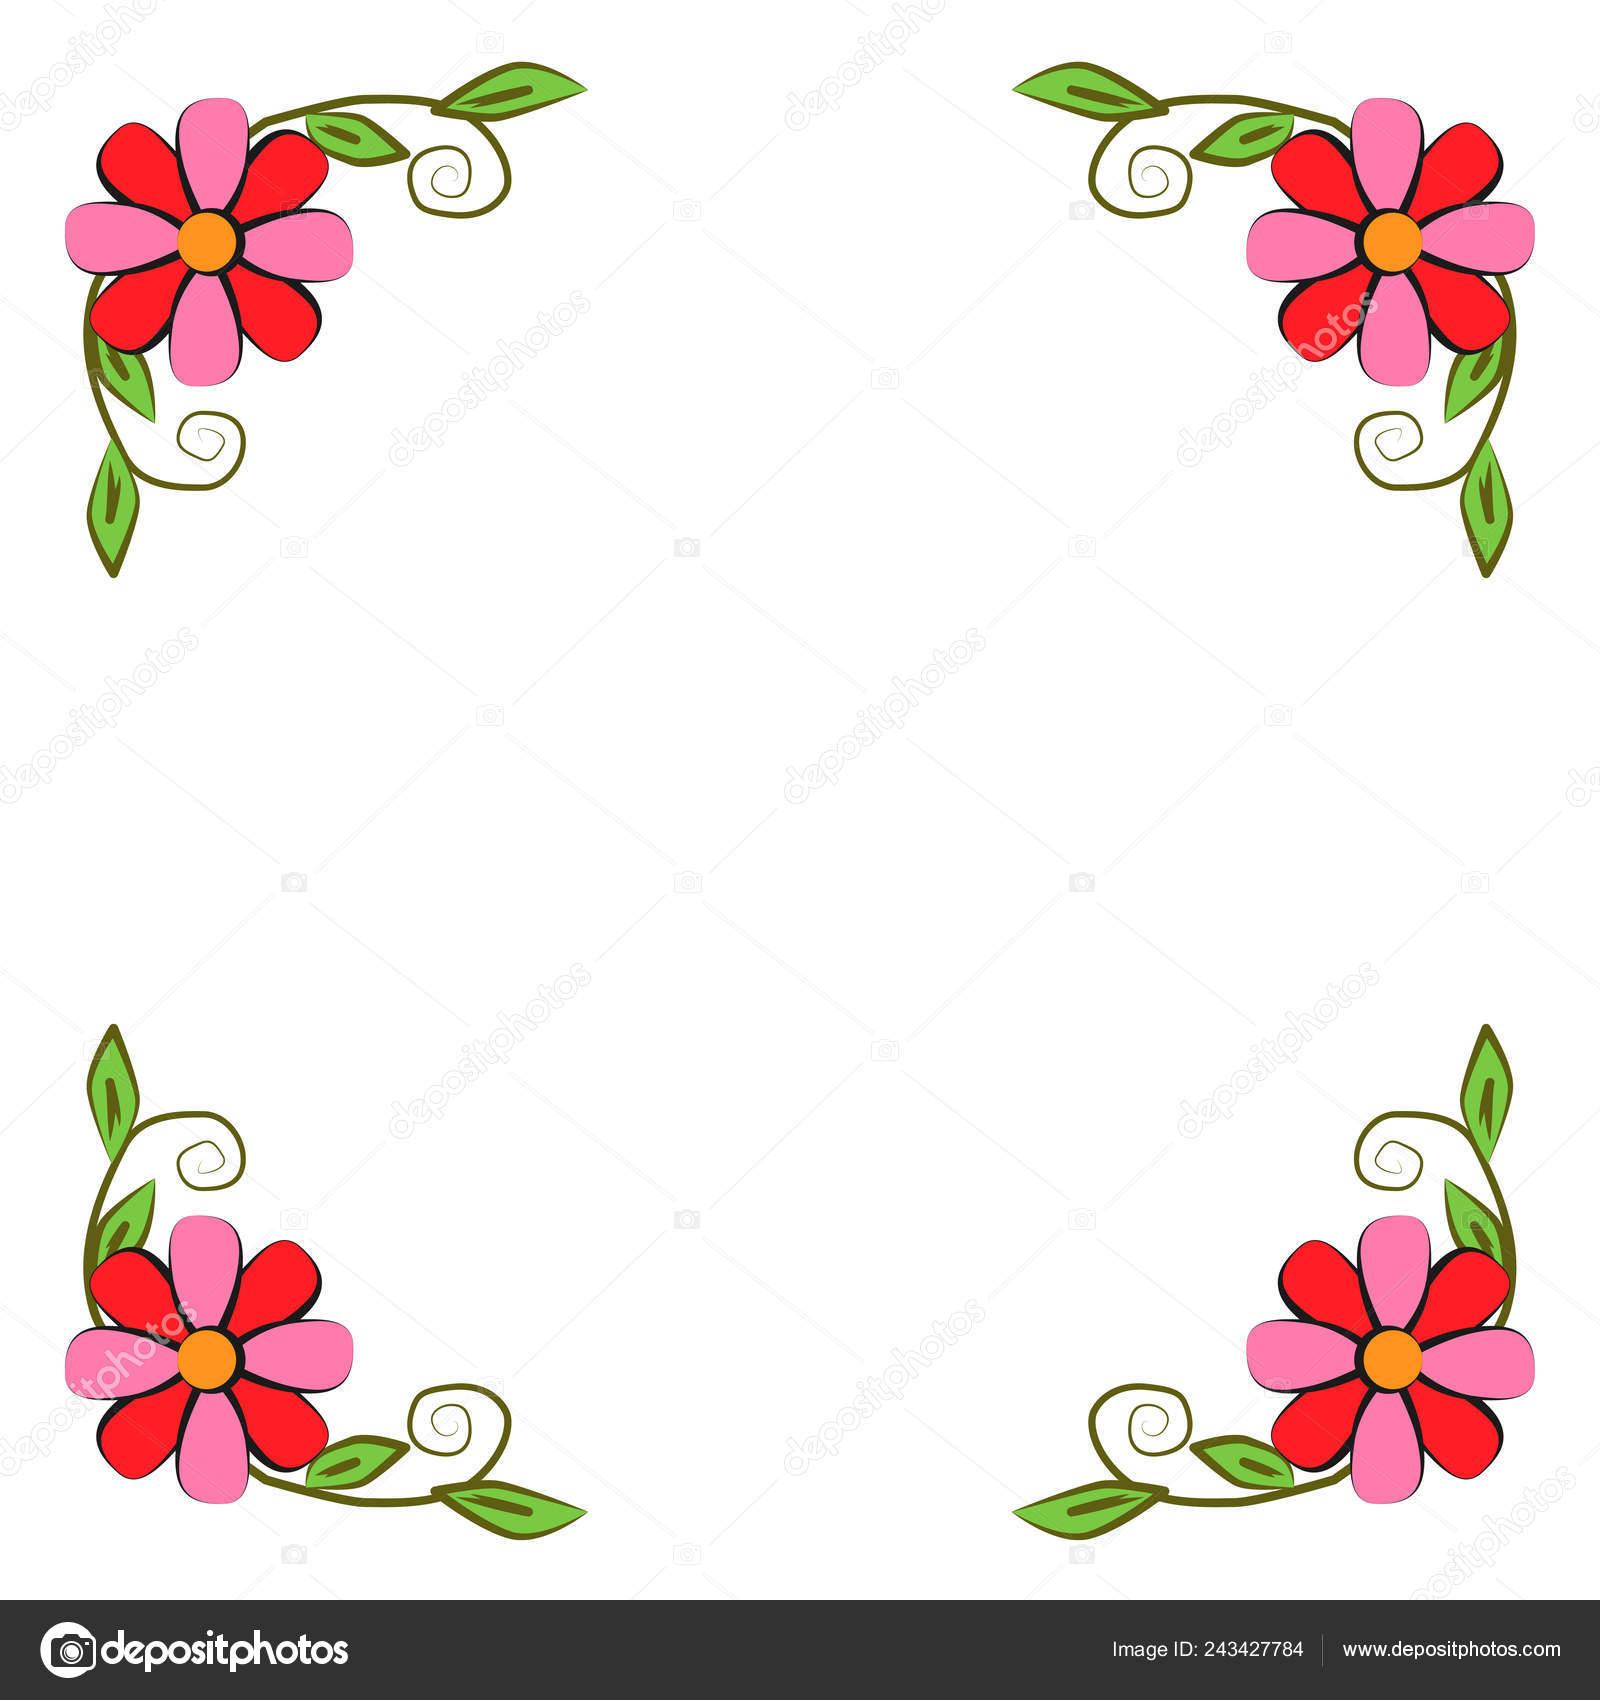 rectangular floral border frame template with decorative corners vector design illustration stock vector c satoof mail ru 243427784 rectangular floral border frame template with decorative corners vector design illustration stock vector c satoof mail ru 243427784